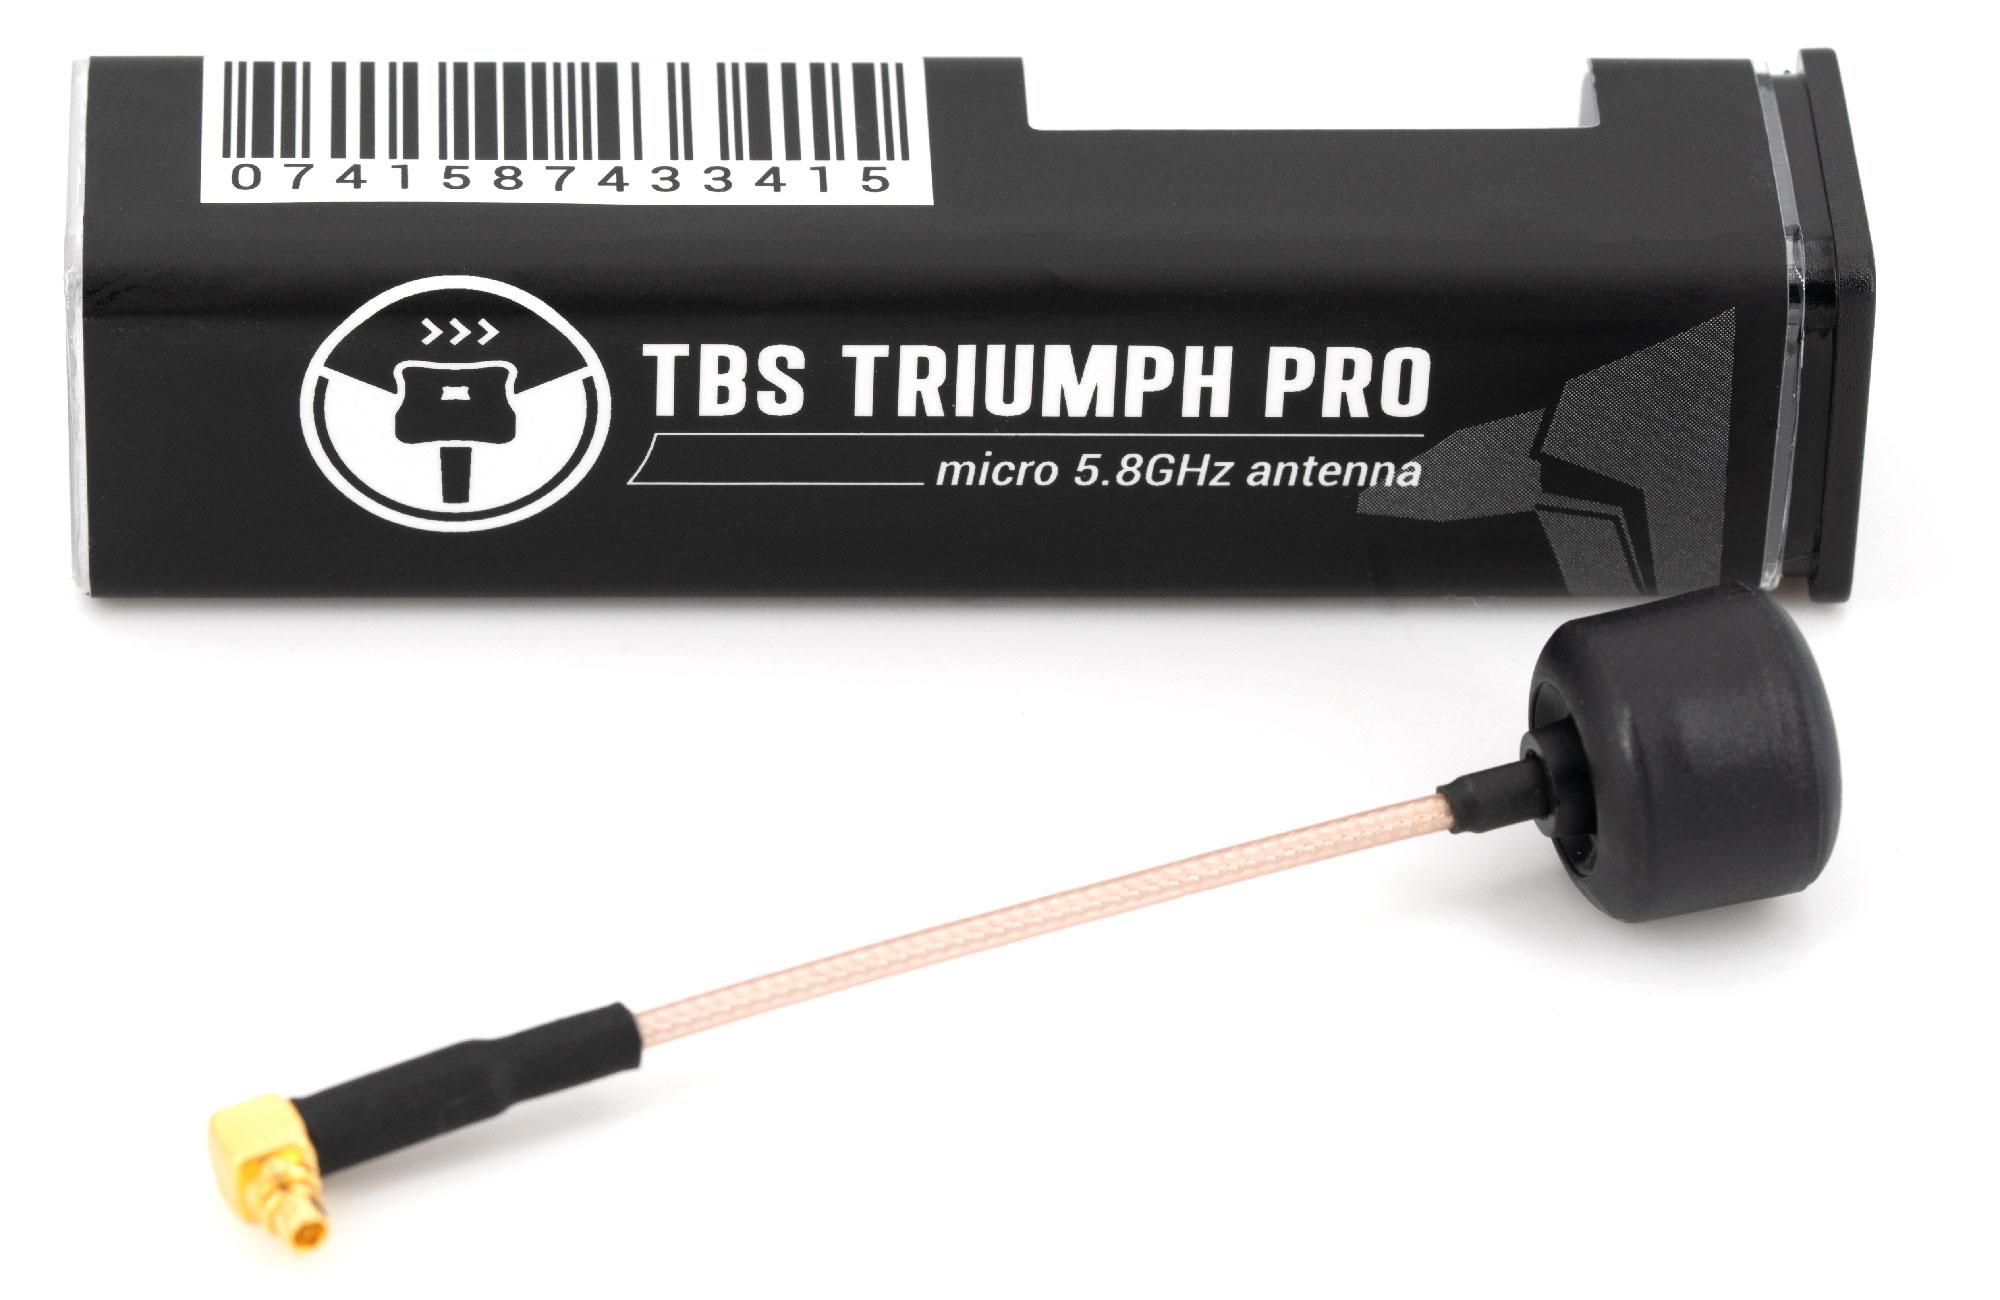 tbs-triumph-pro-mmcx-antenna_4.jpg